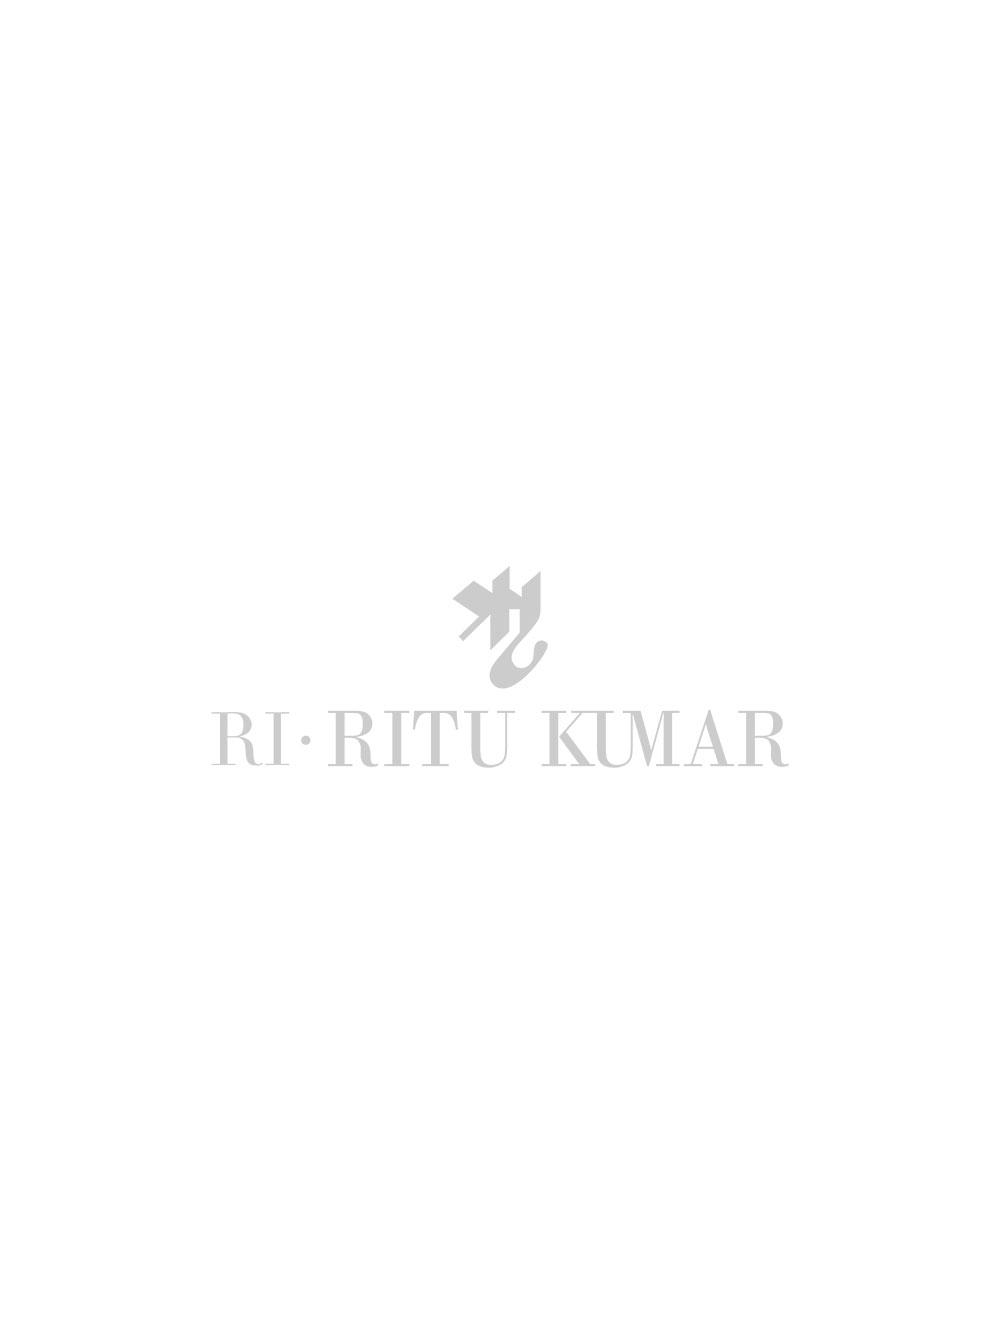 Off White & Khaki Embroidered Kurti